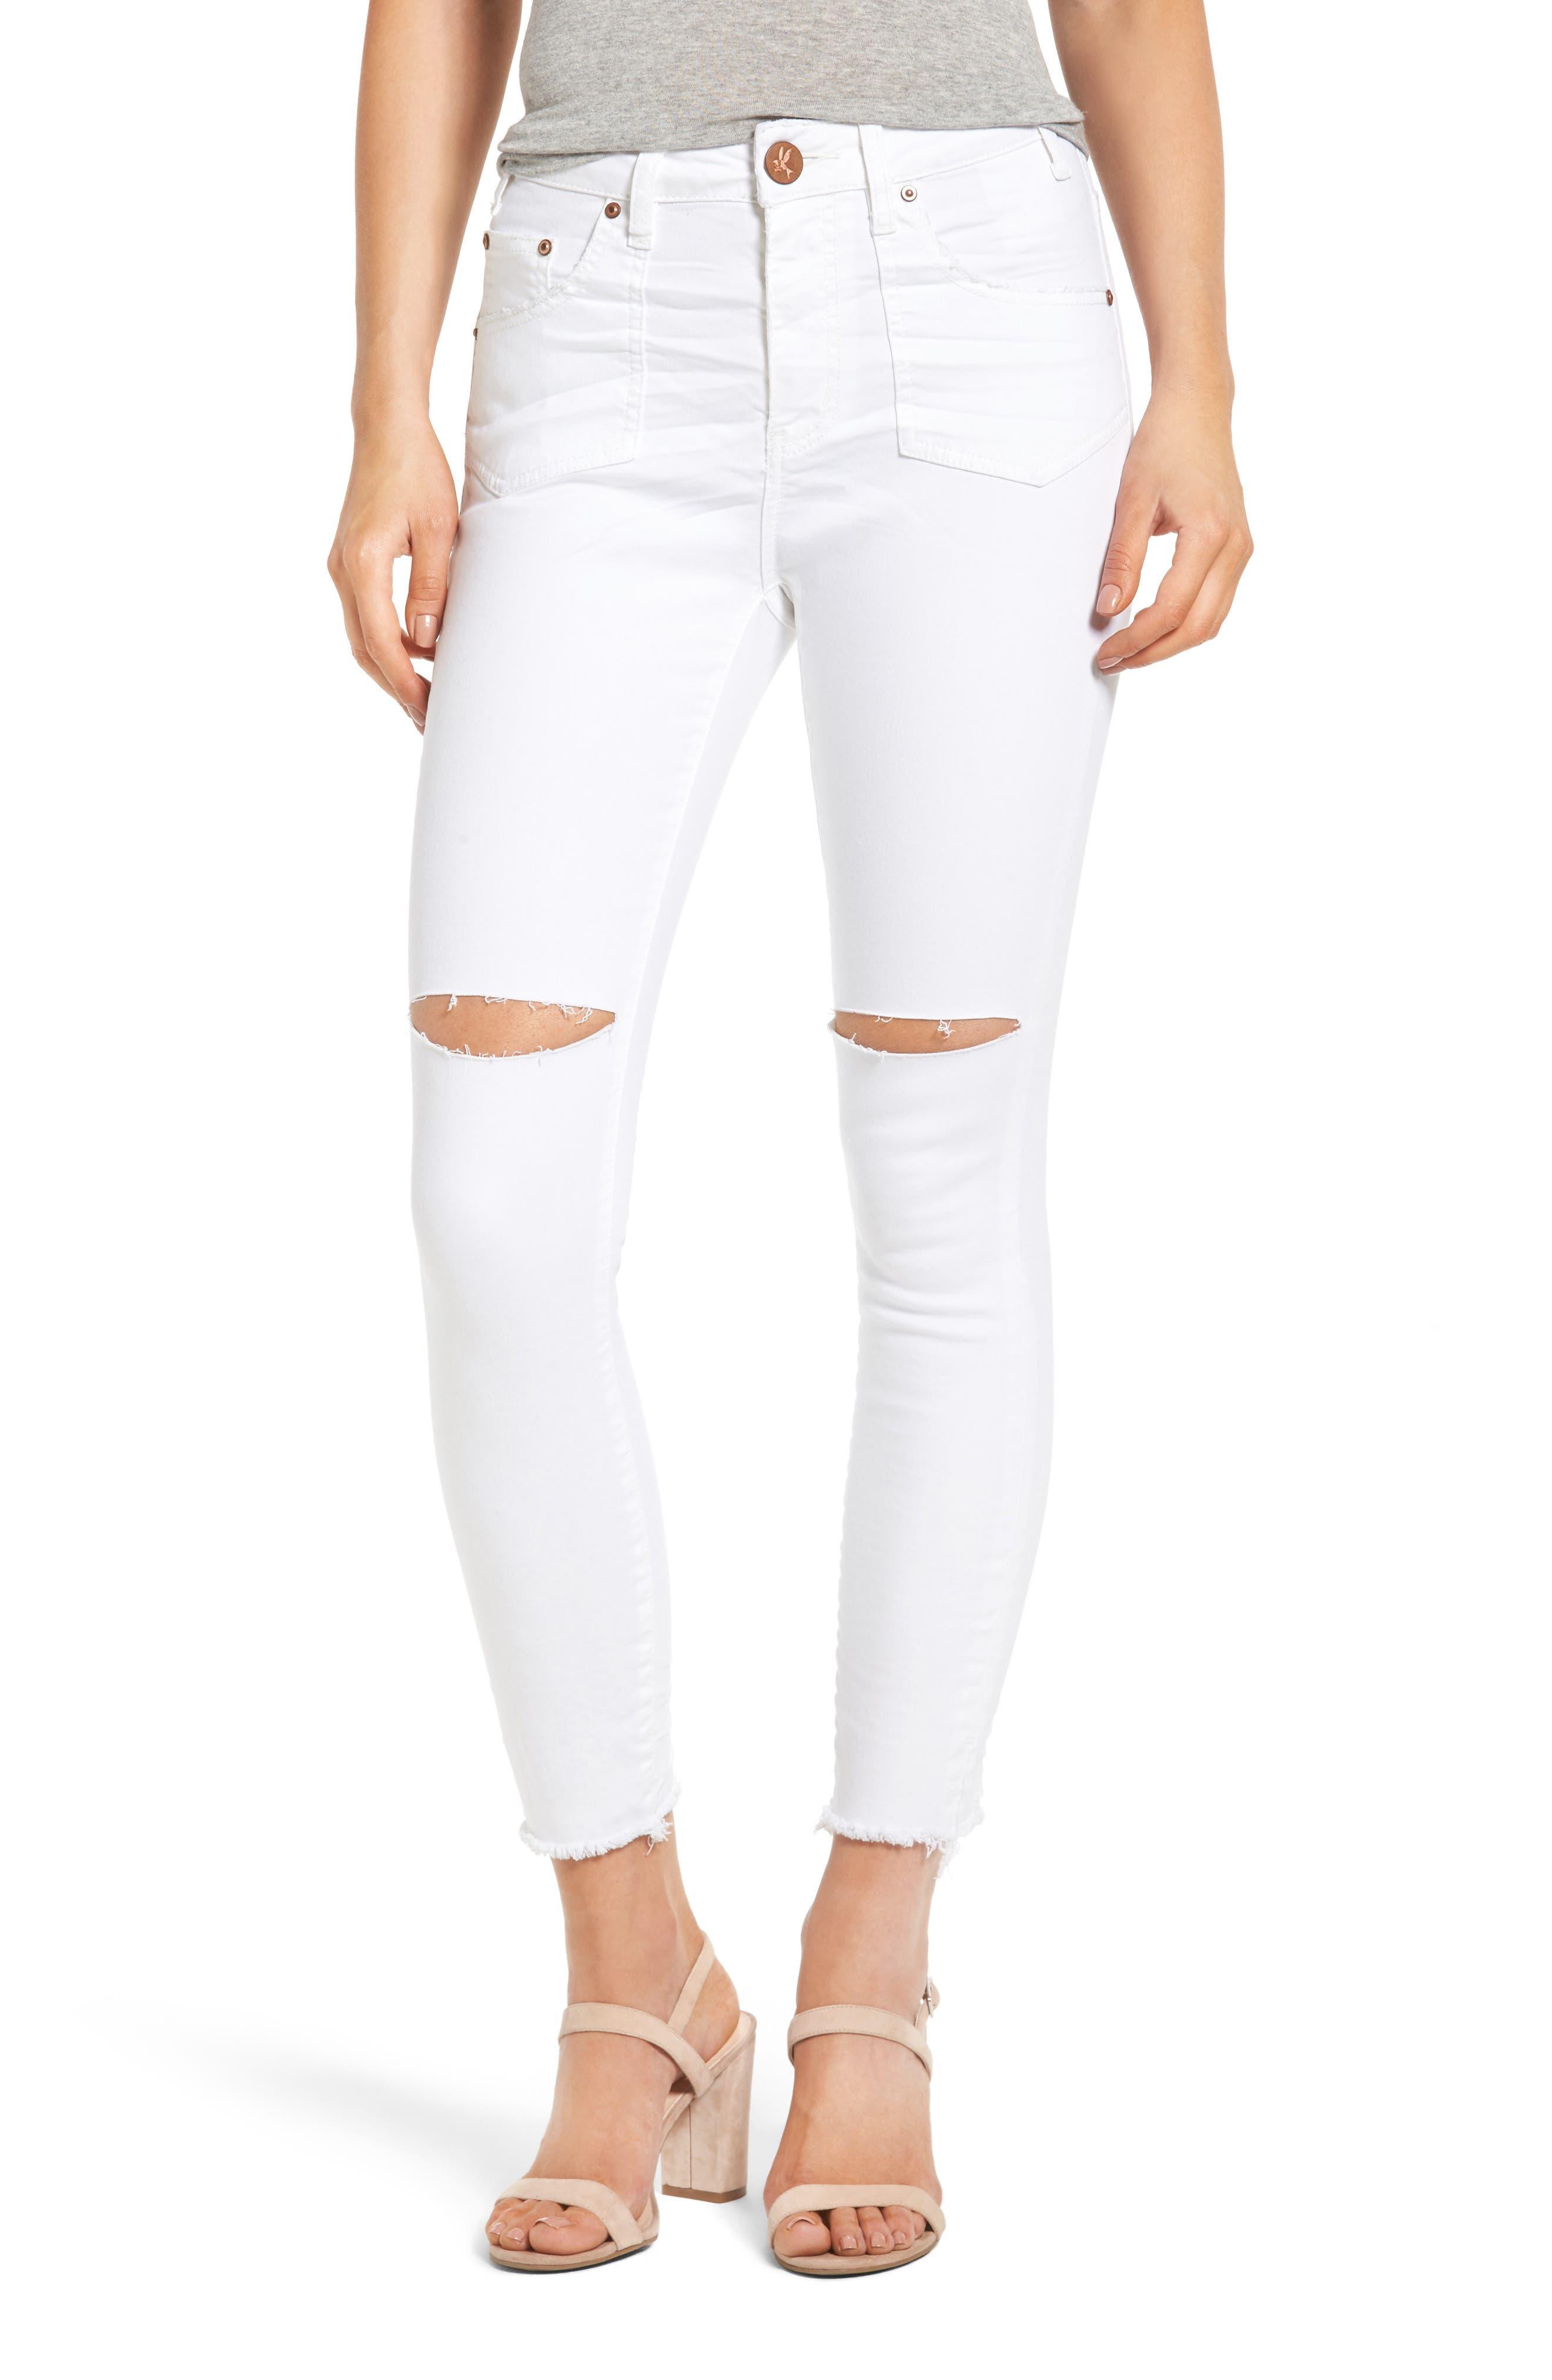 One Teaspoon Freebird High Waist Ripped Skinny Jeans (Premium White)